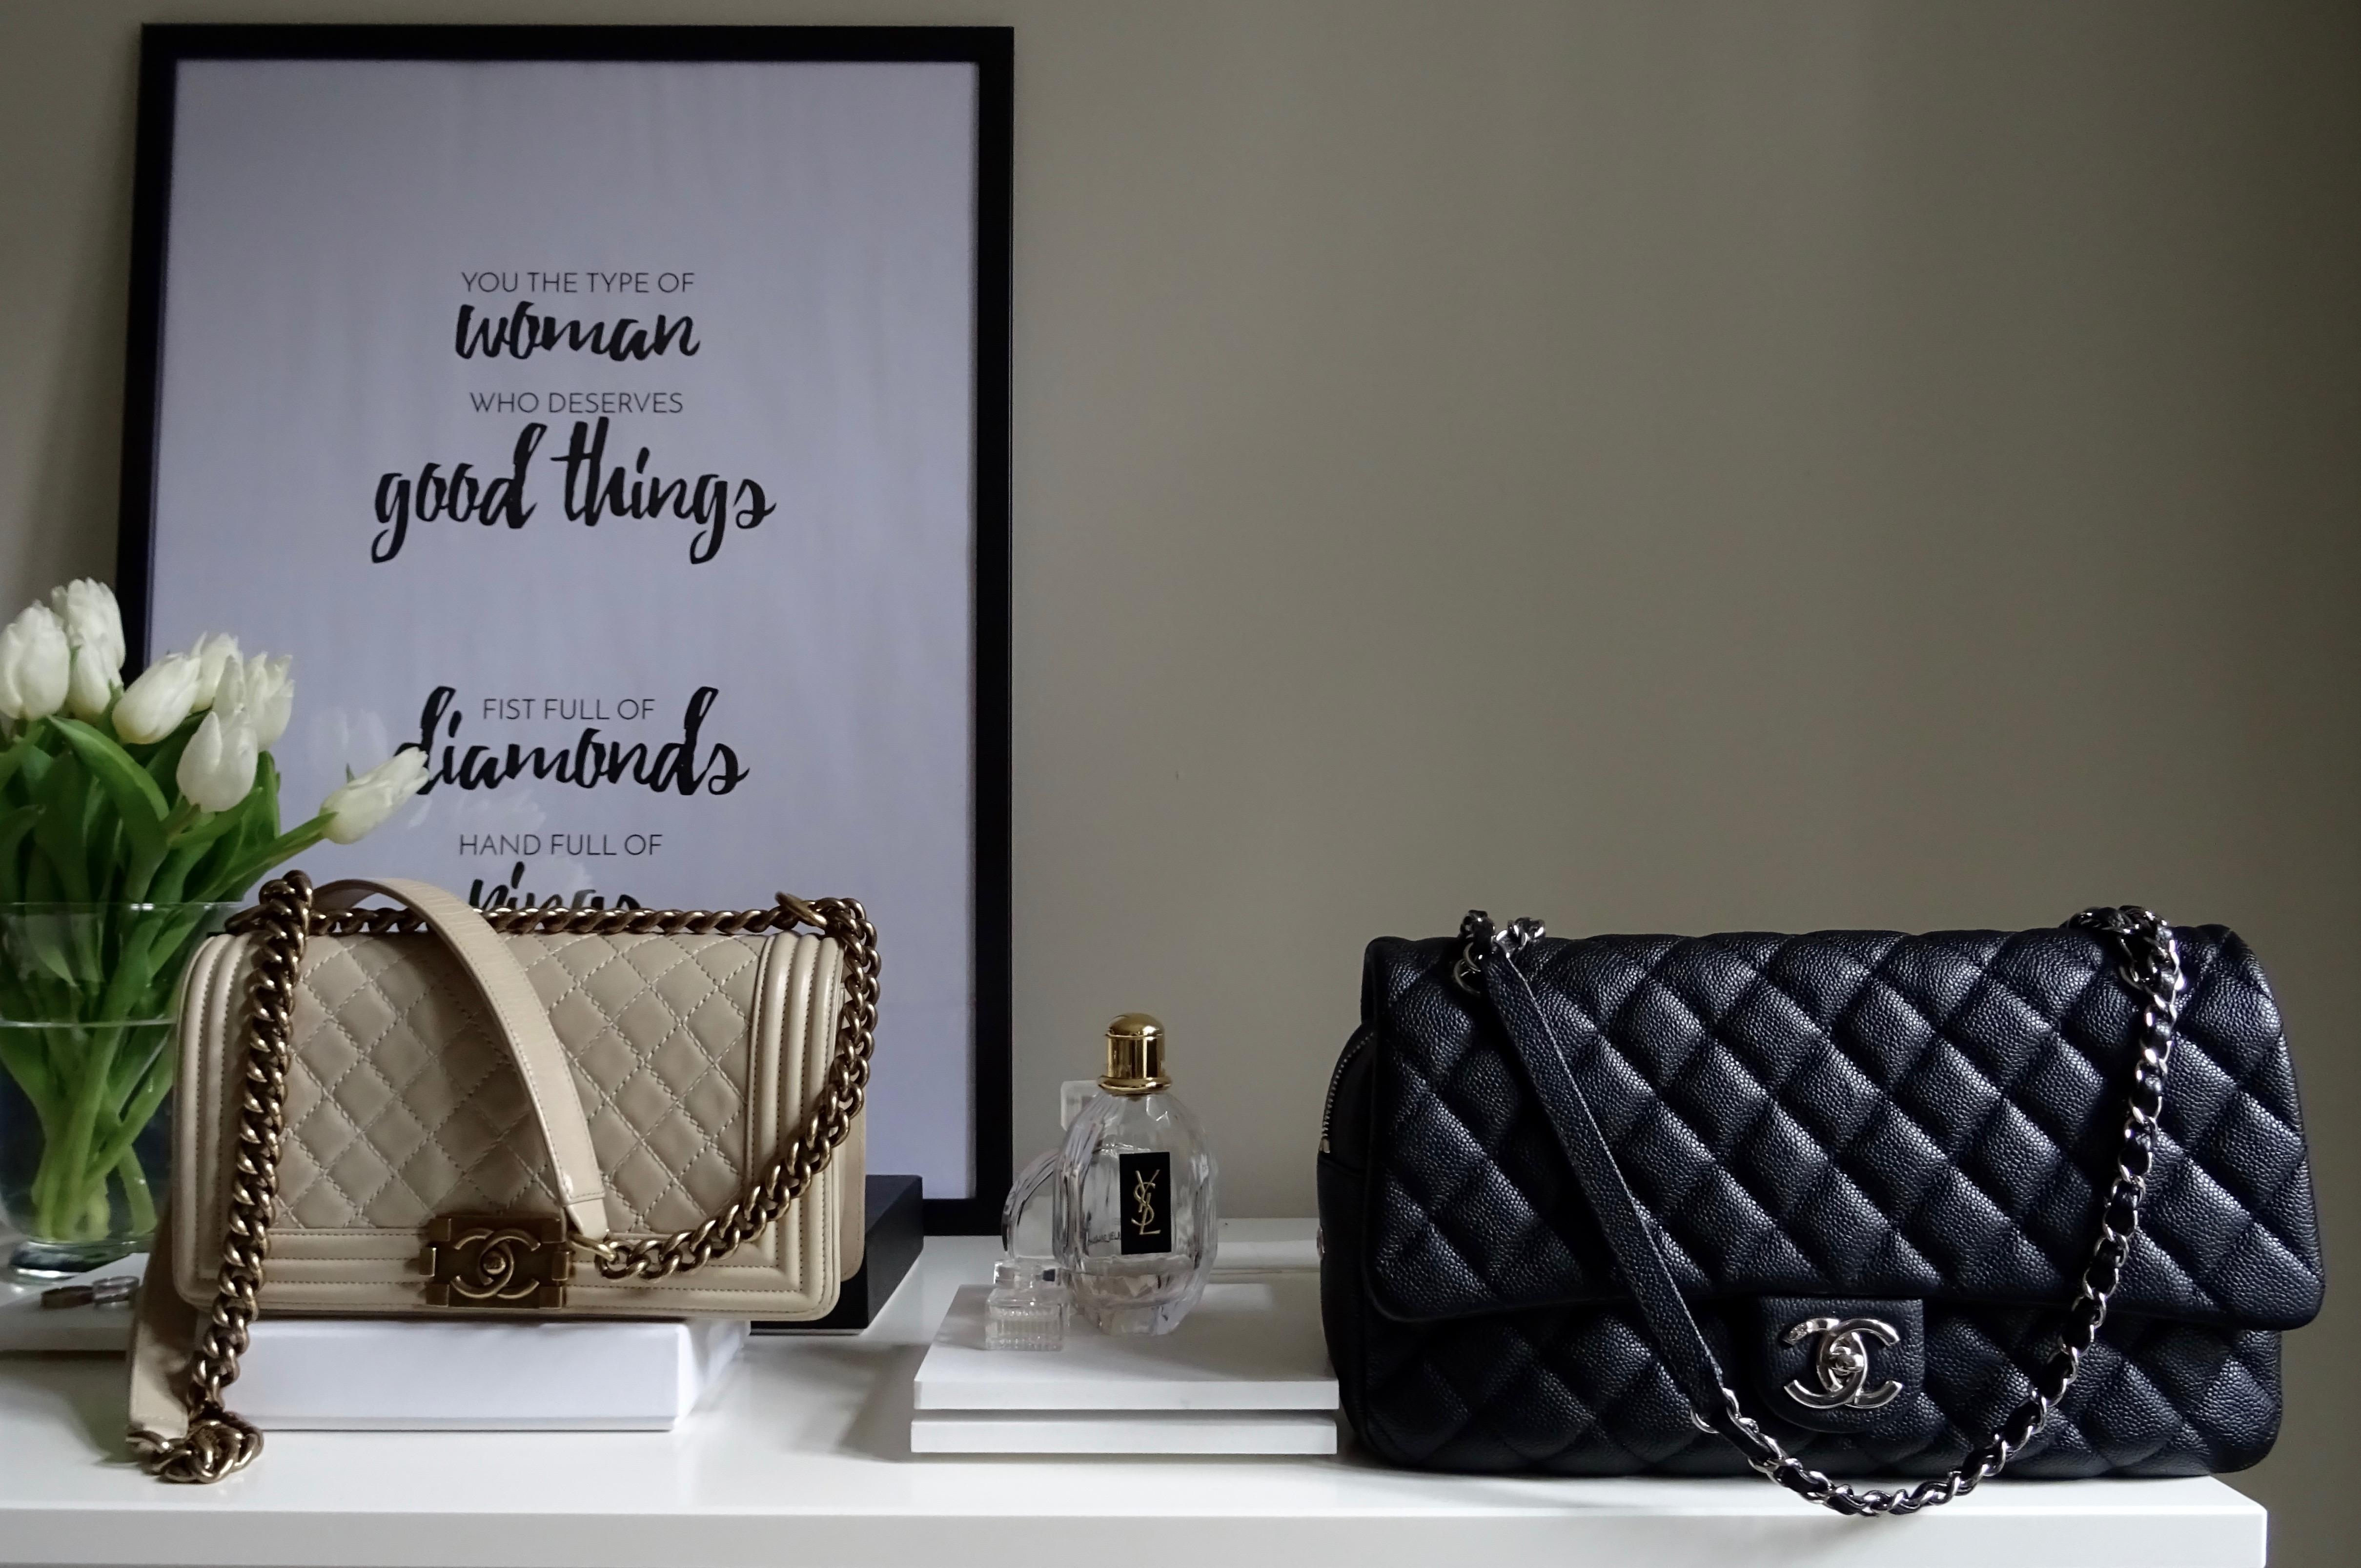 MonMode, Mon Mode Blog, Blogger Berlin, Chanel Bag, Chanel Boy, Le Boy, Buy Chanel Bag, How to